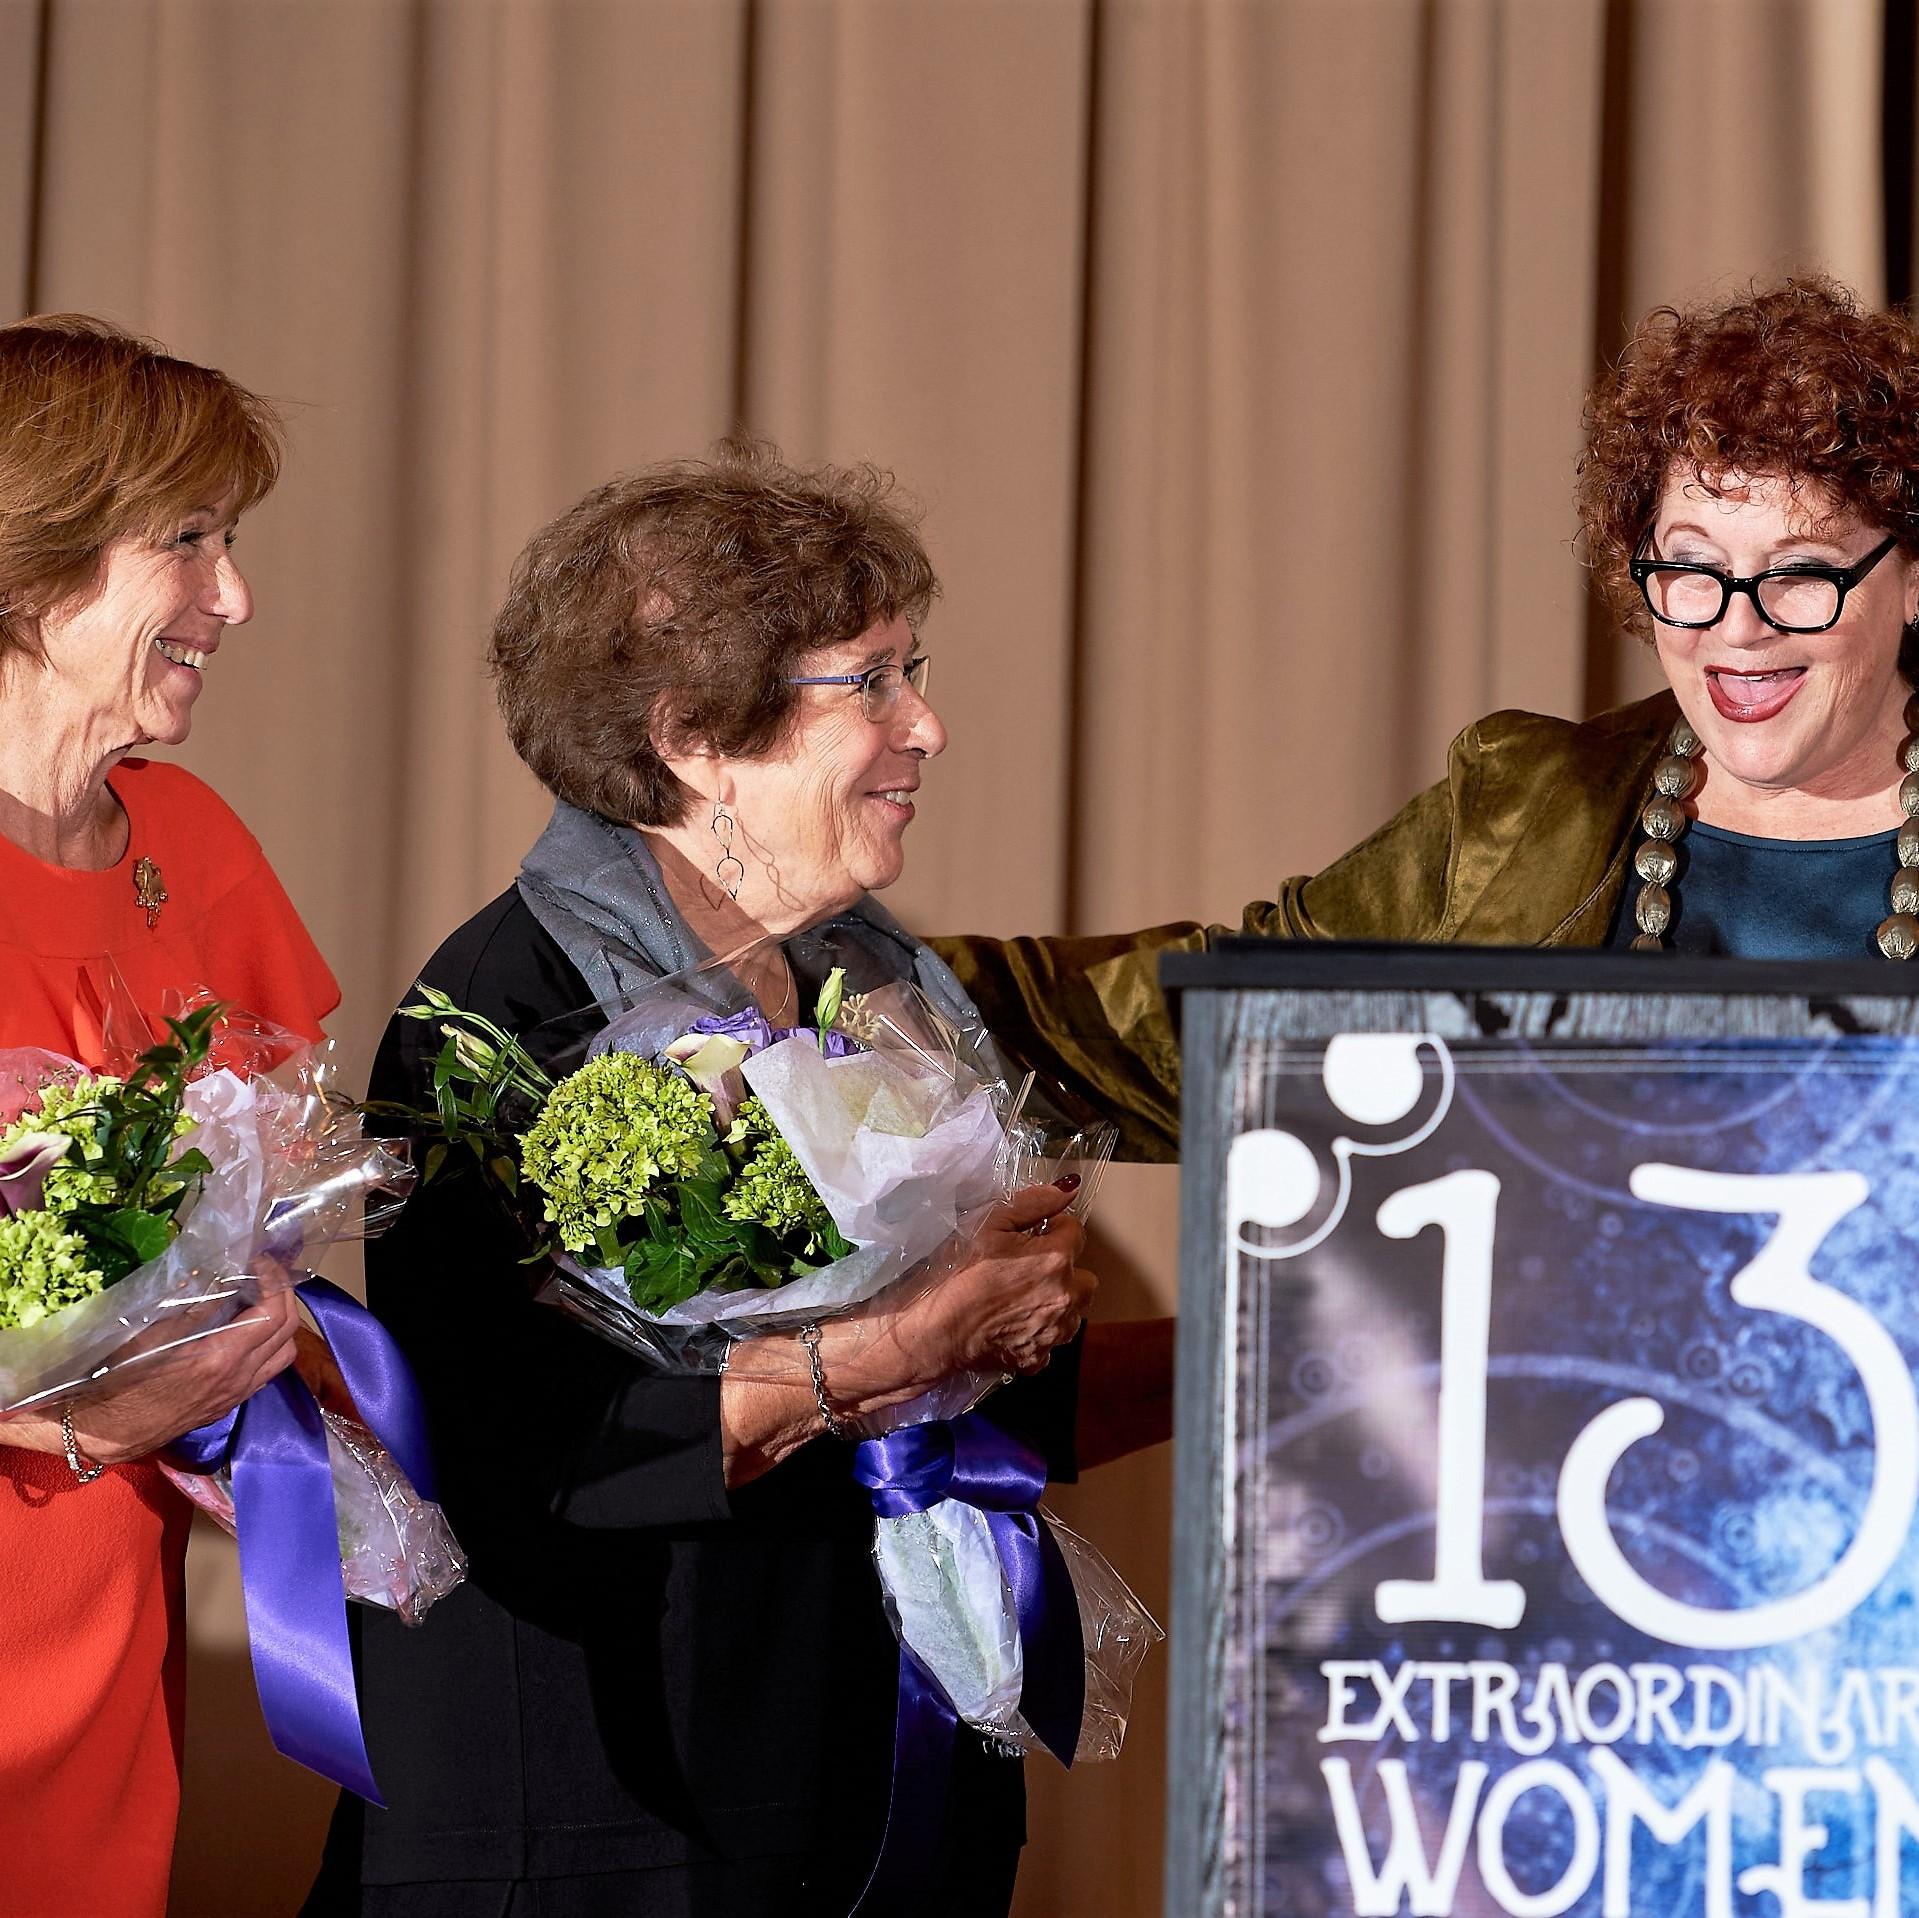 Debrah Barish, Claudia Kadis and Carin Savel closing out 13 Extraordinary Women